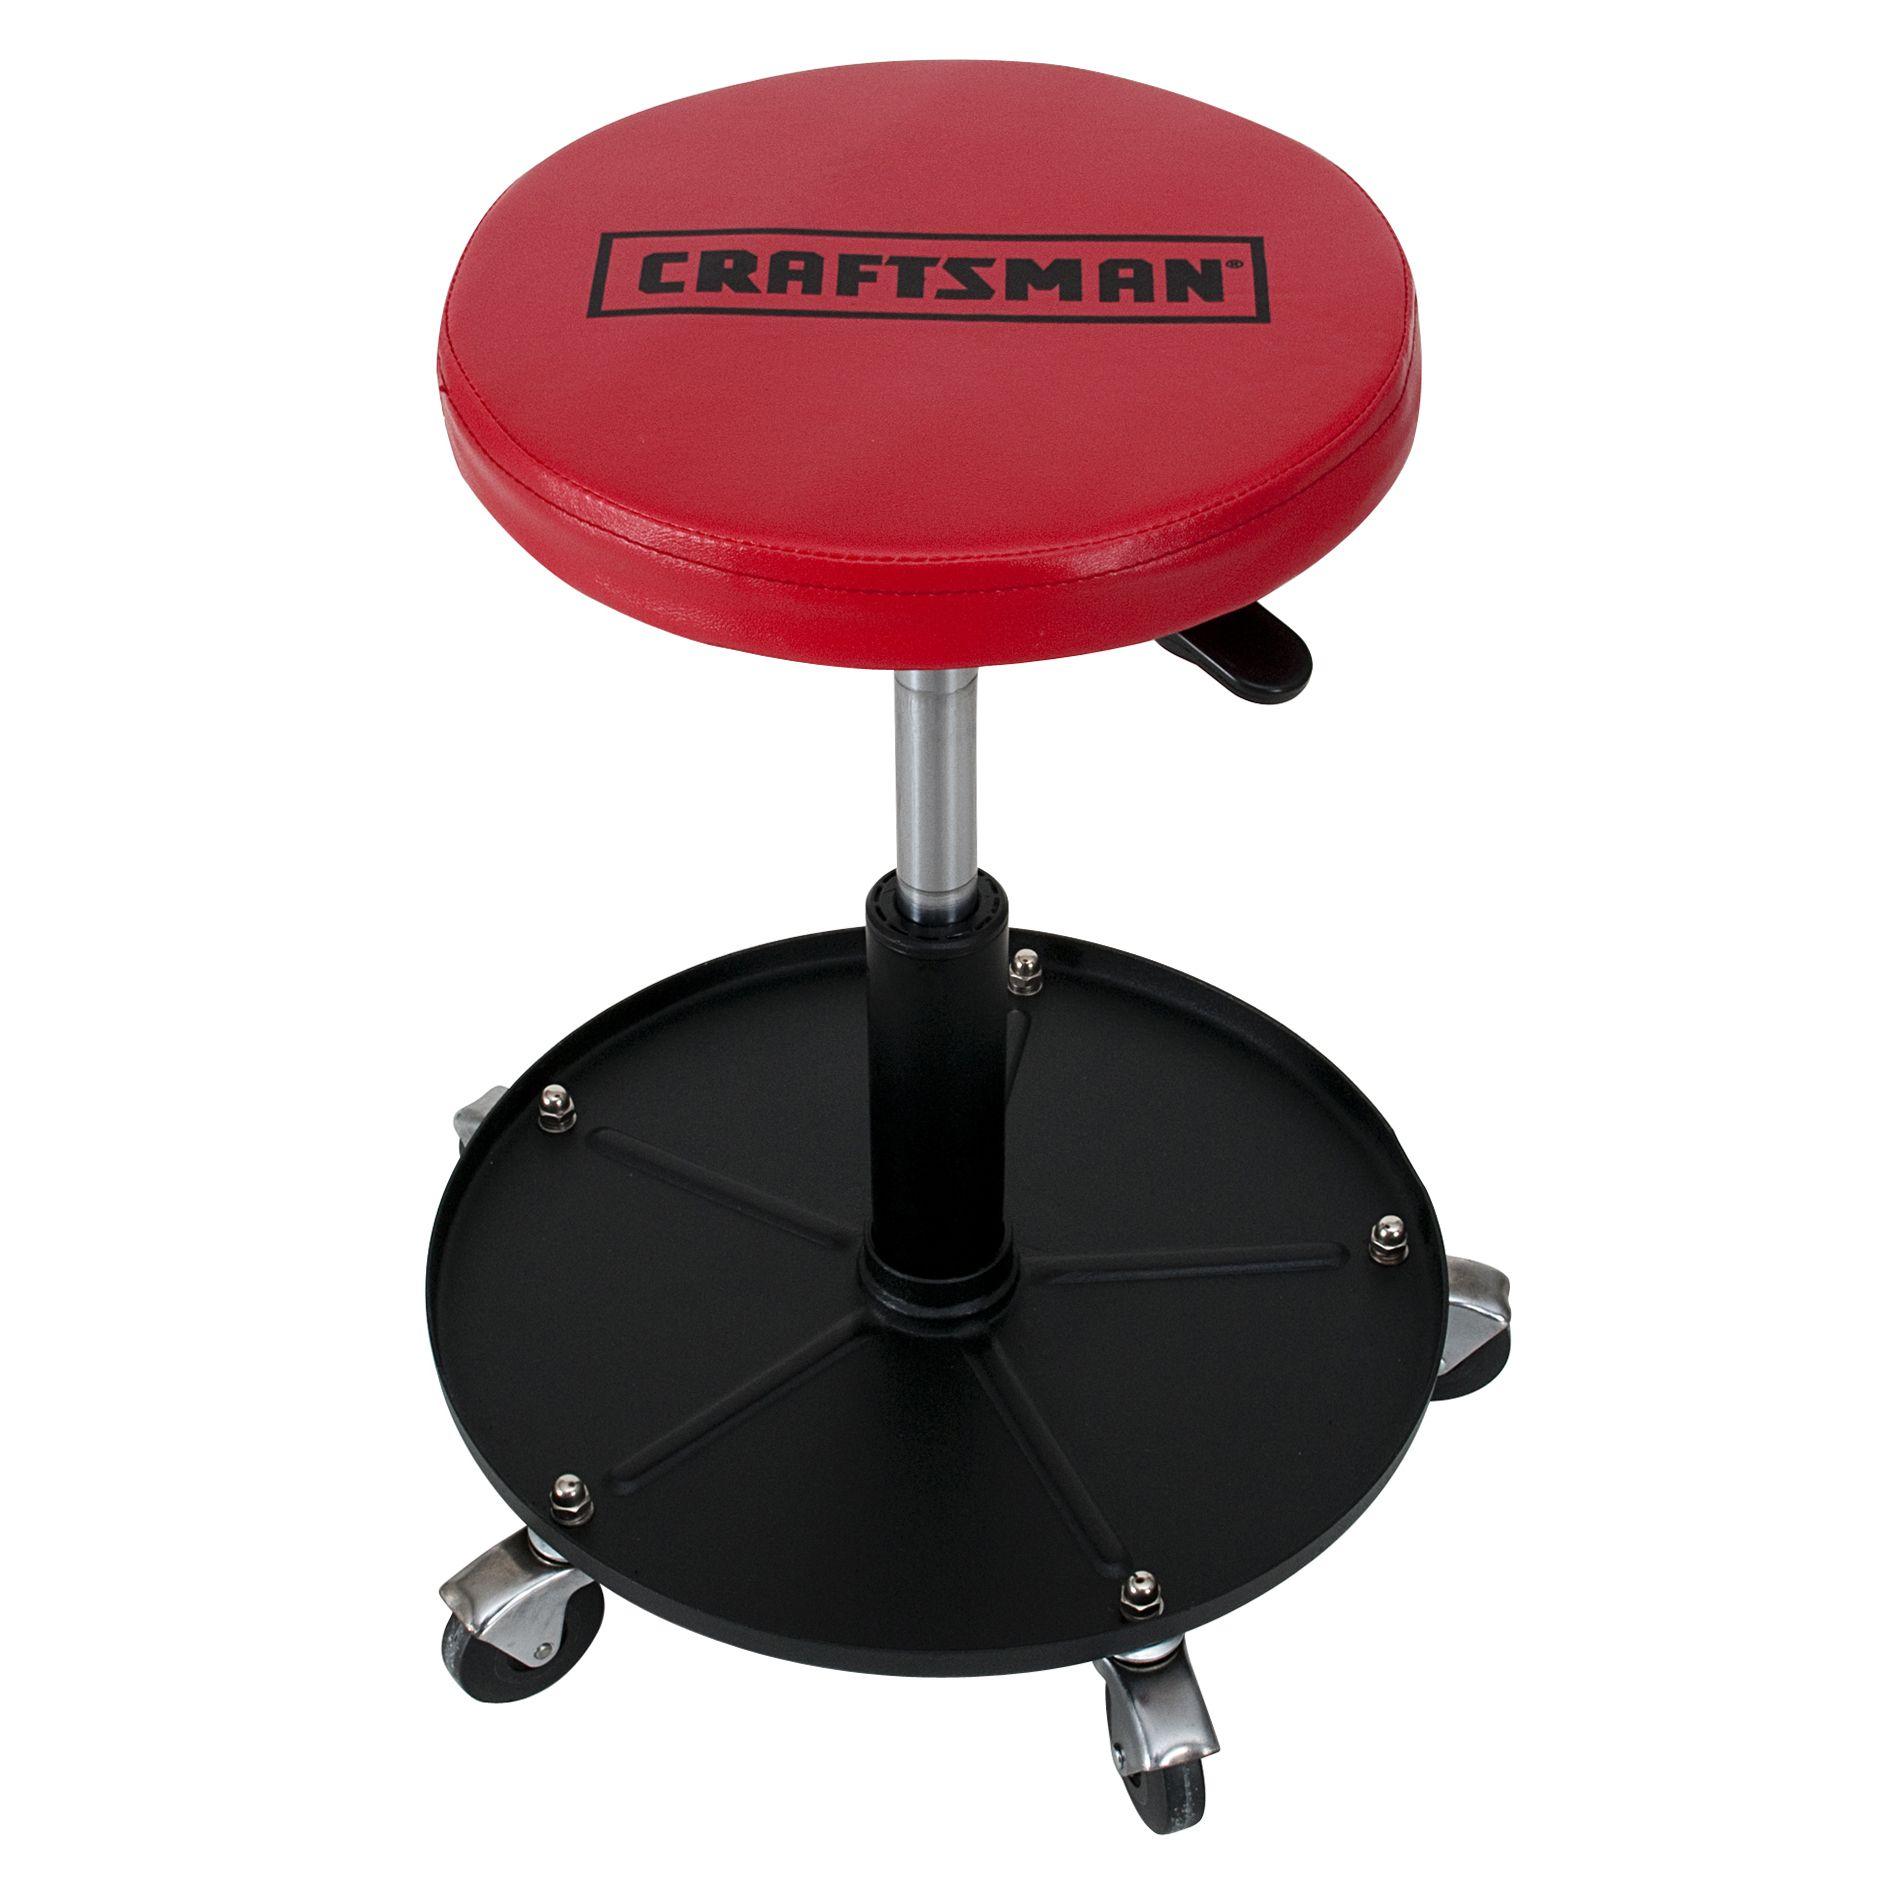 sc 1 st  Kmart & Craftsman Adjustable Mechanics Seat islam-shia.org